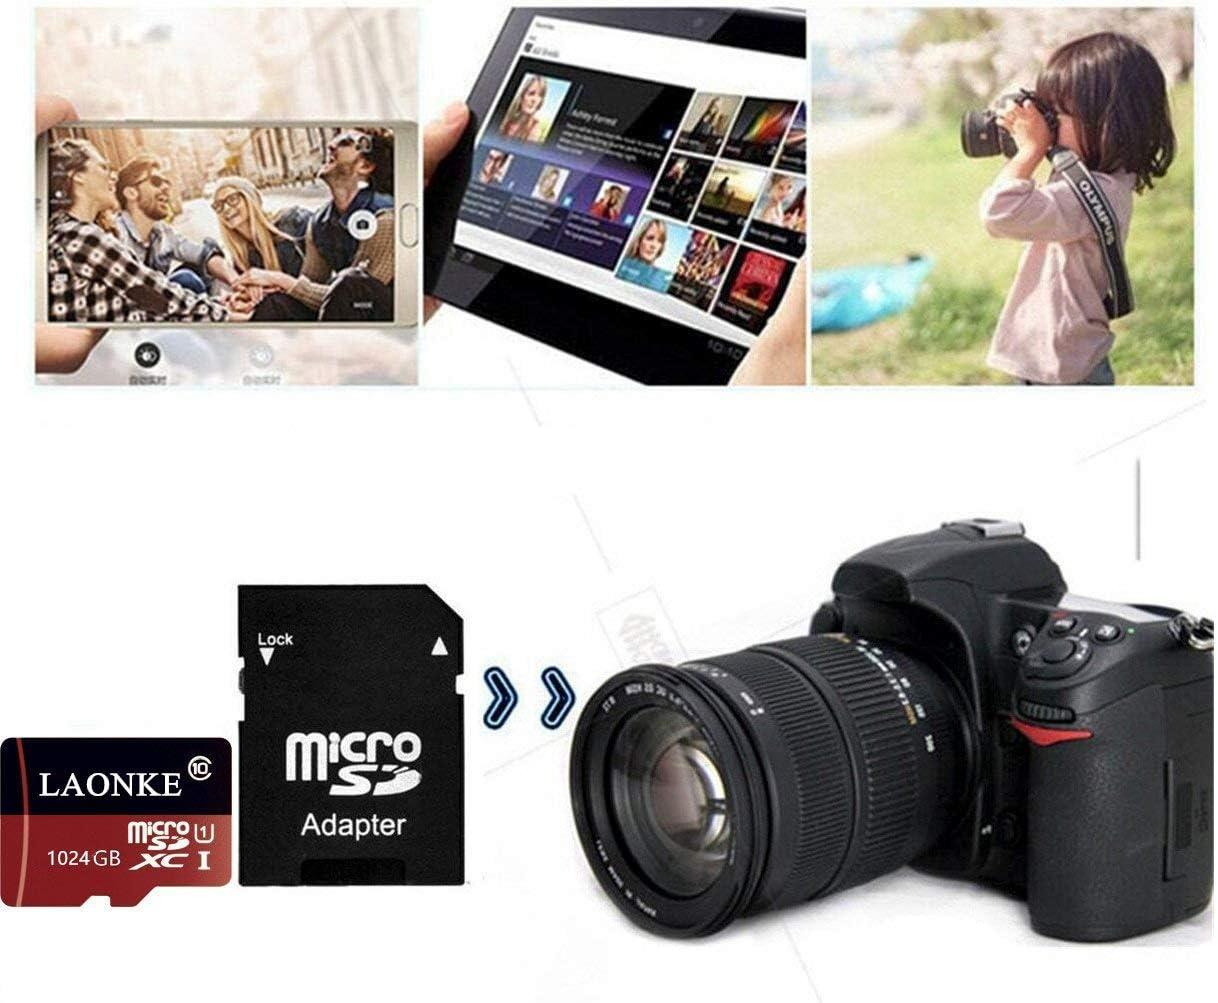 256 GB 1024 GB 512 GB classe 10 ad alta velocit/à con adattatore SD Flash Card 400 GB Scheda di memoria Micro SD da 128 GB